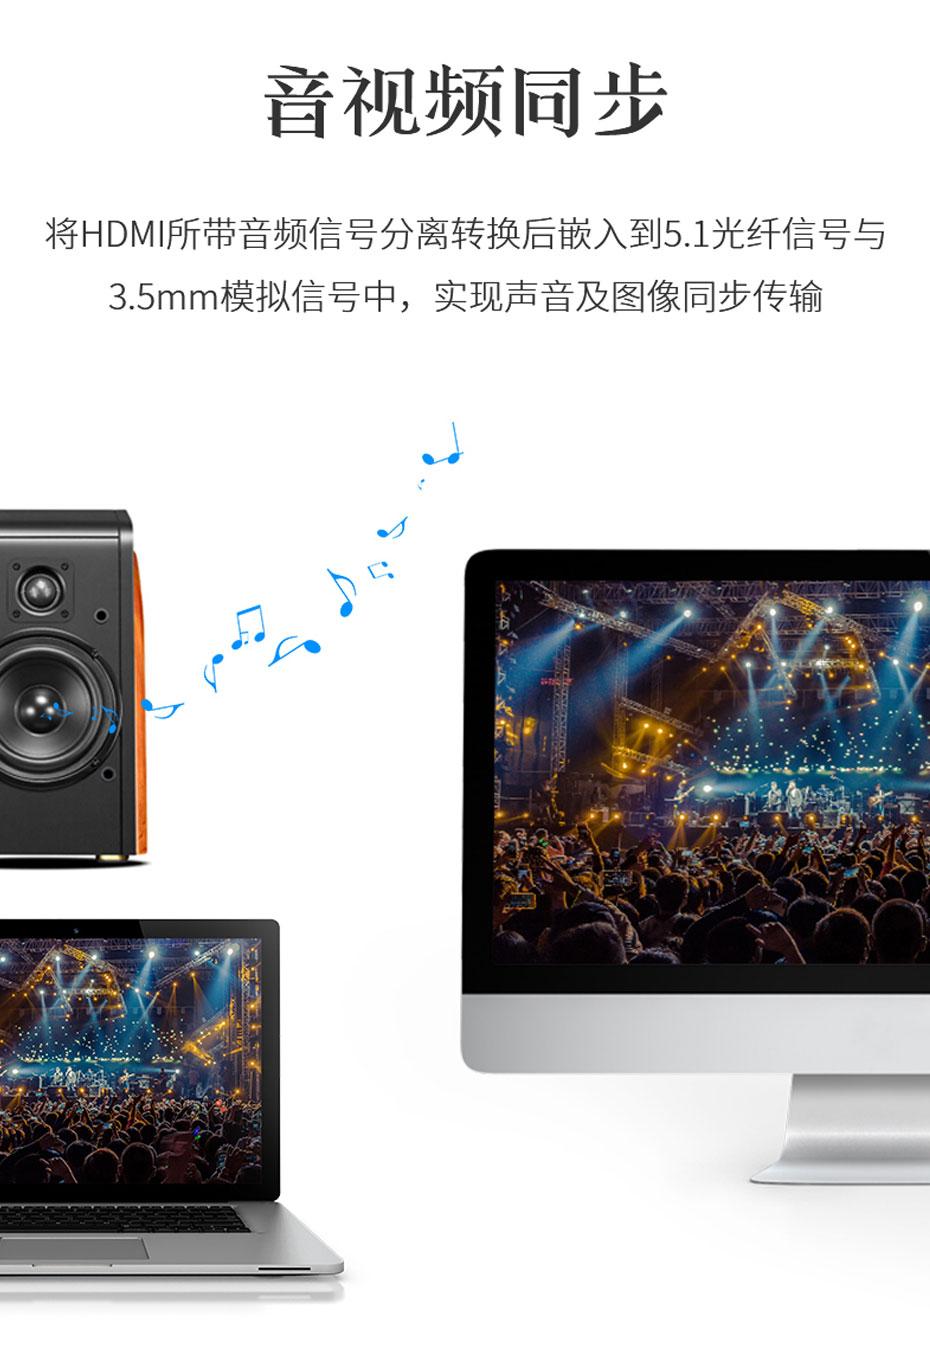 HDMI切换器2进2出212H支持音视频同步